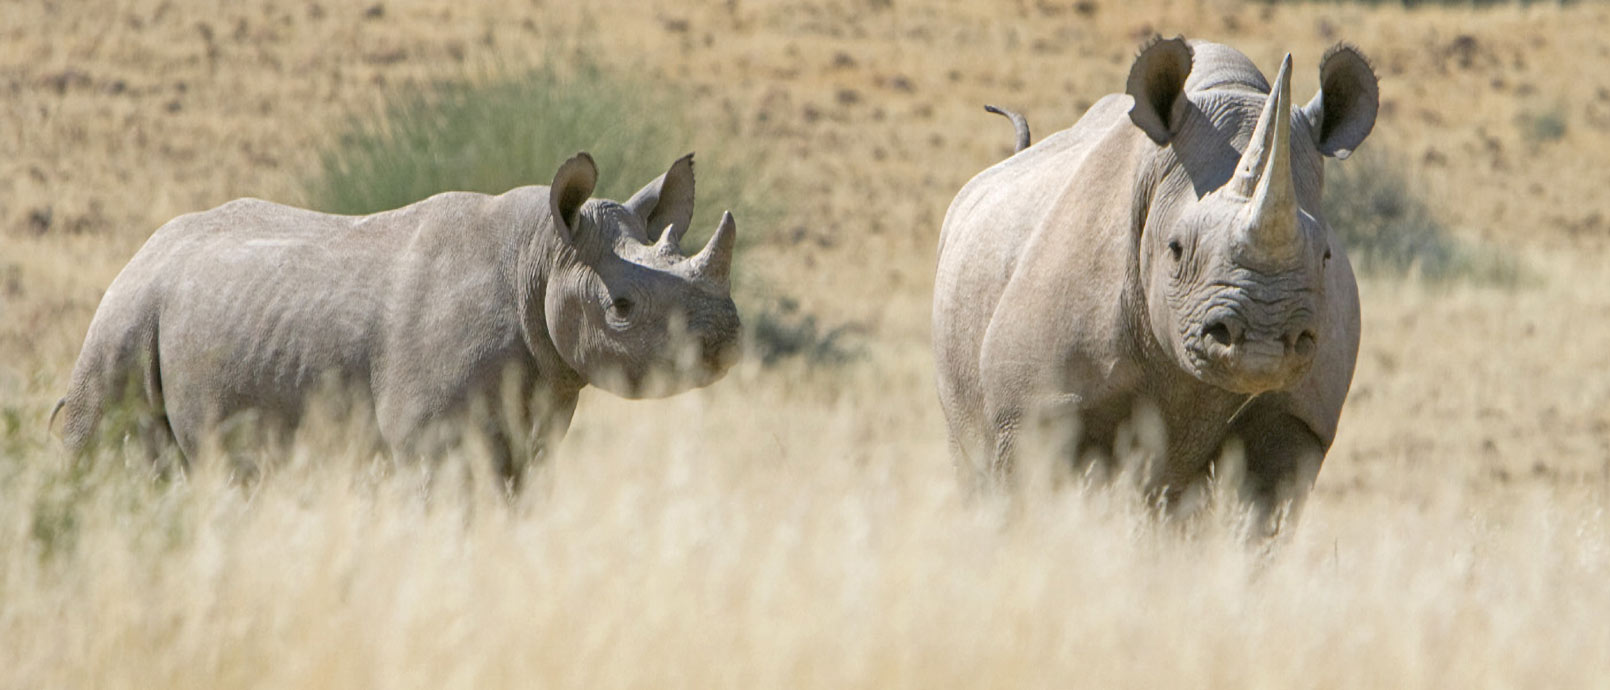 Rhinocéros dans le désert du Namid Rhino Desert Camp